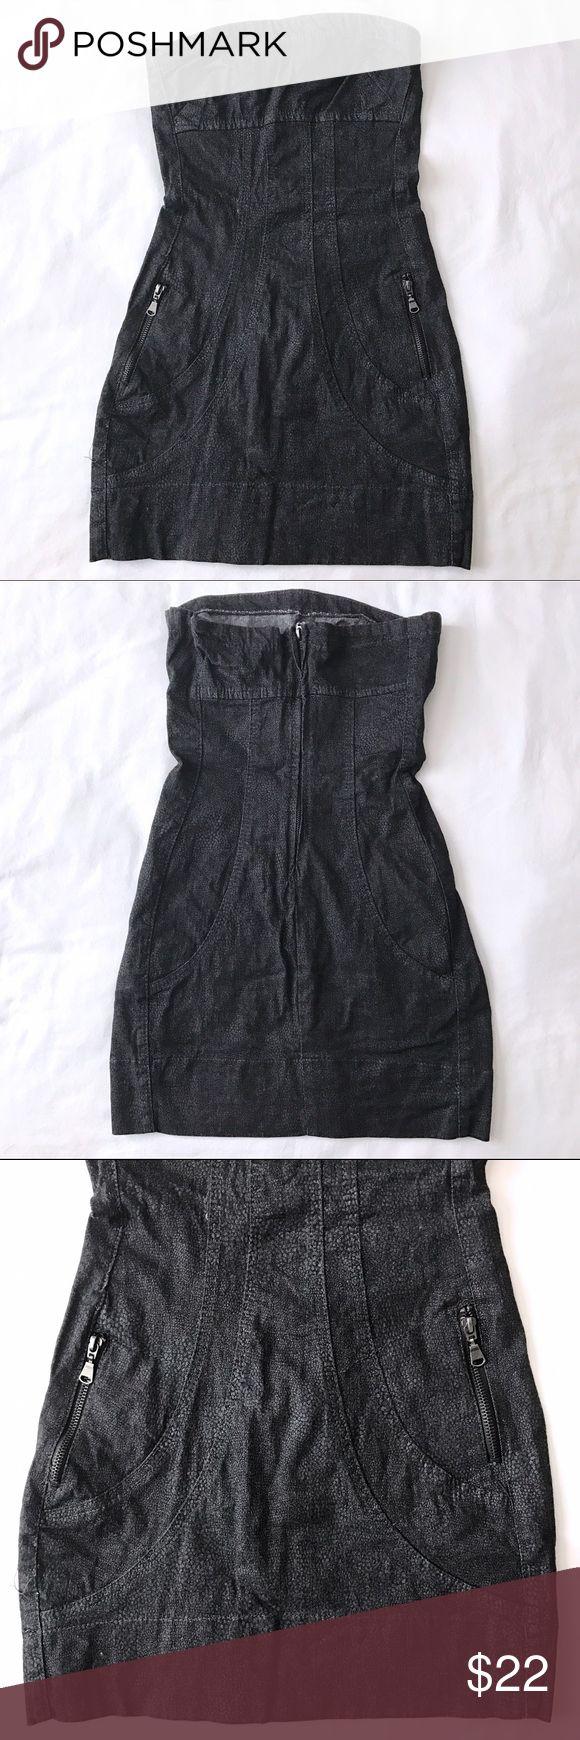 Selling this Zara trf ✨Black Denim✨Mini Tube Top Dress S on Poshmark! My username is: mih03. #shopmycloset #poshmark #fashion #shopping #style #forsale #Zara #Dresses & Skirts